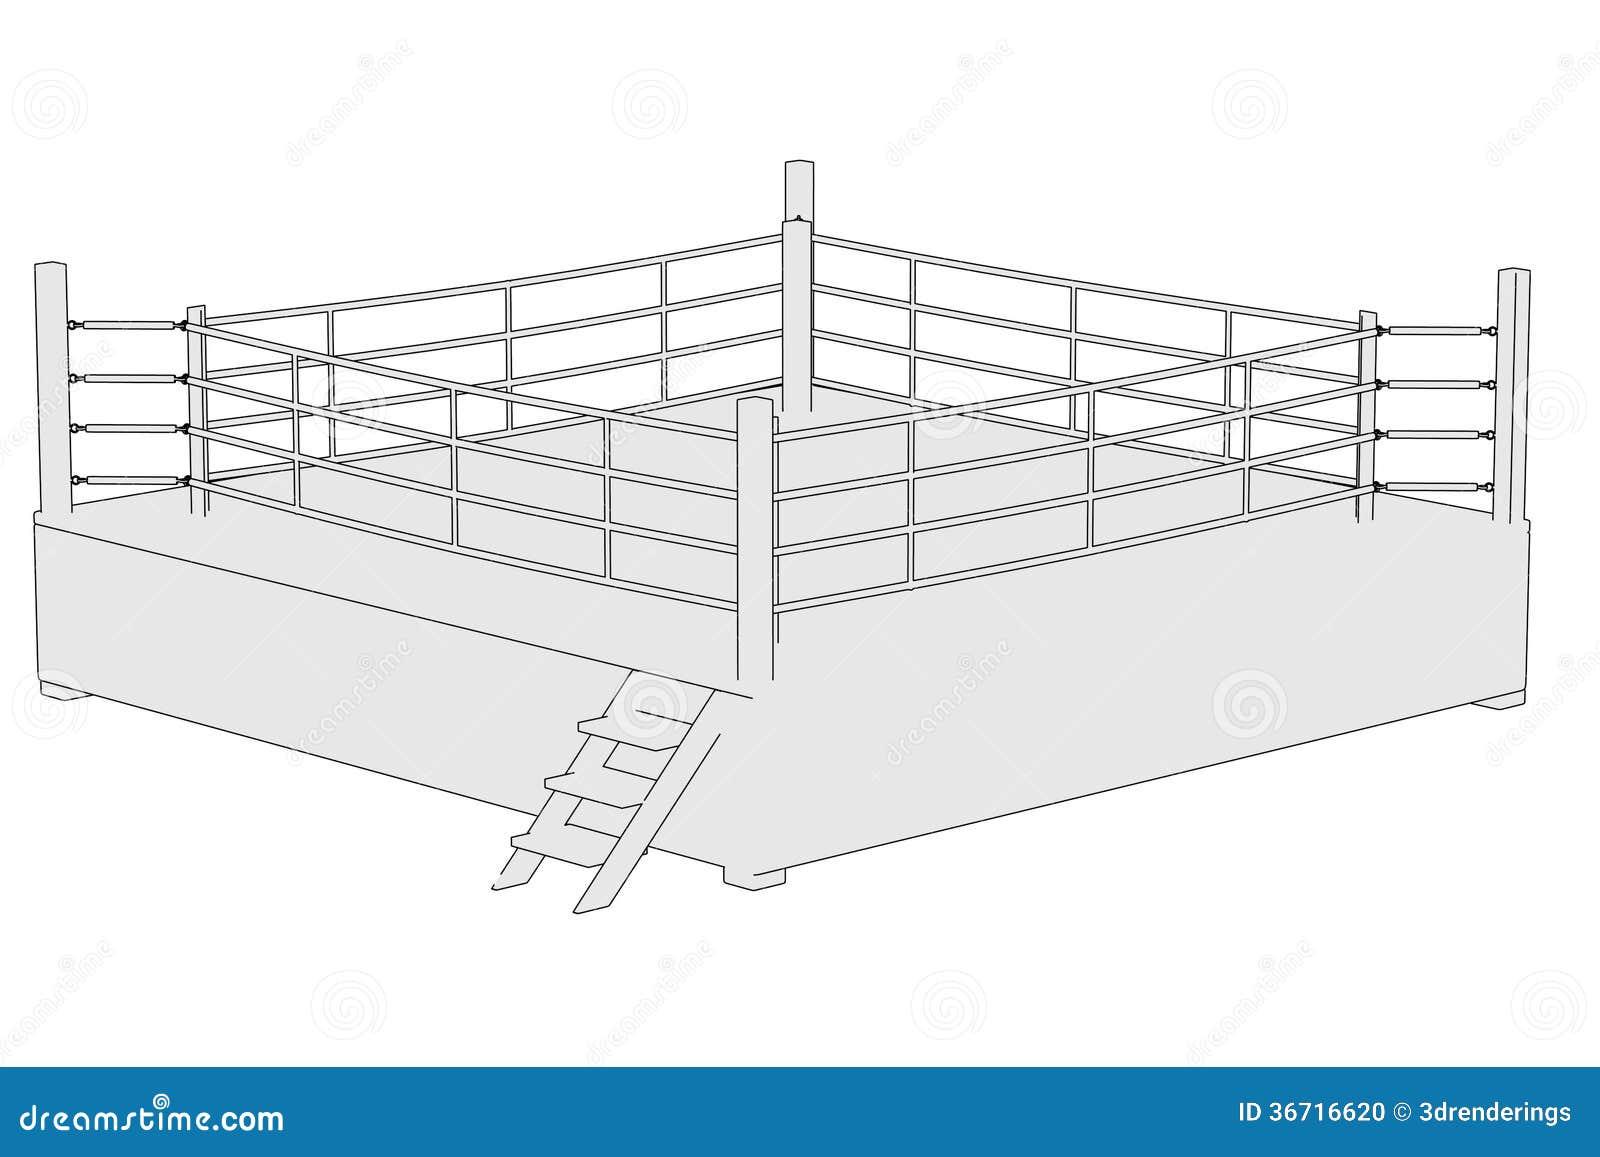 Image of boxing ring stock illustration illustration of fighter image of boxing ring ccuart Images